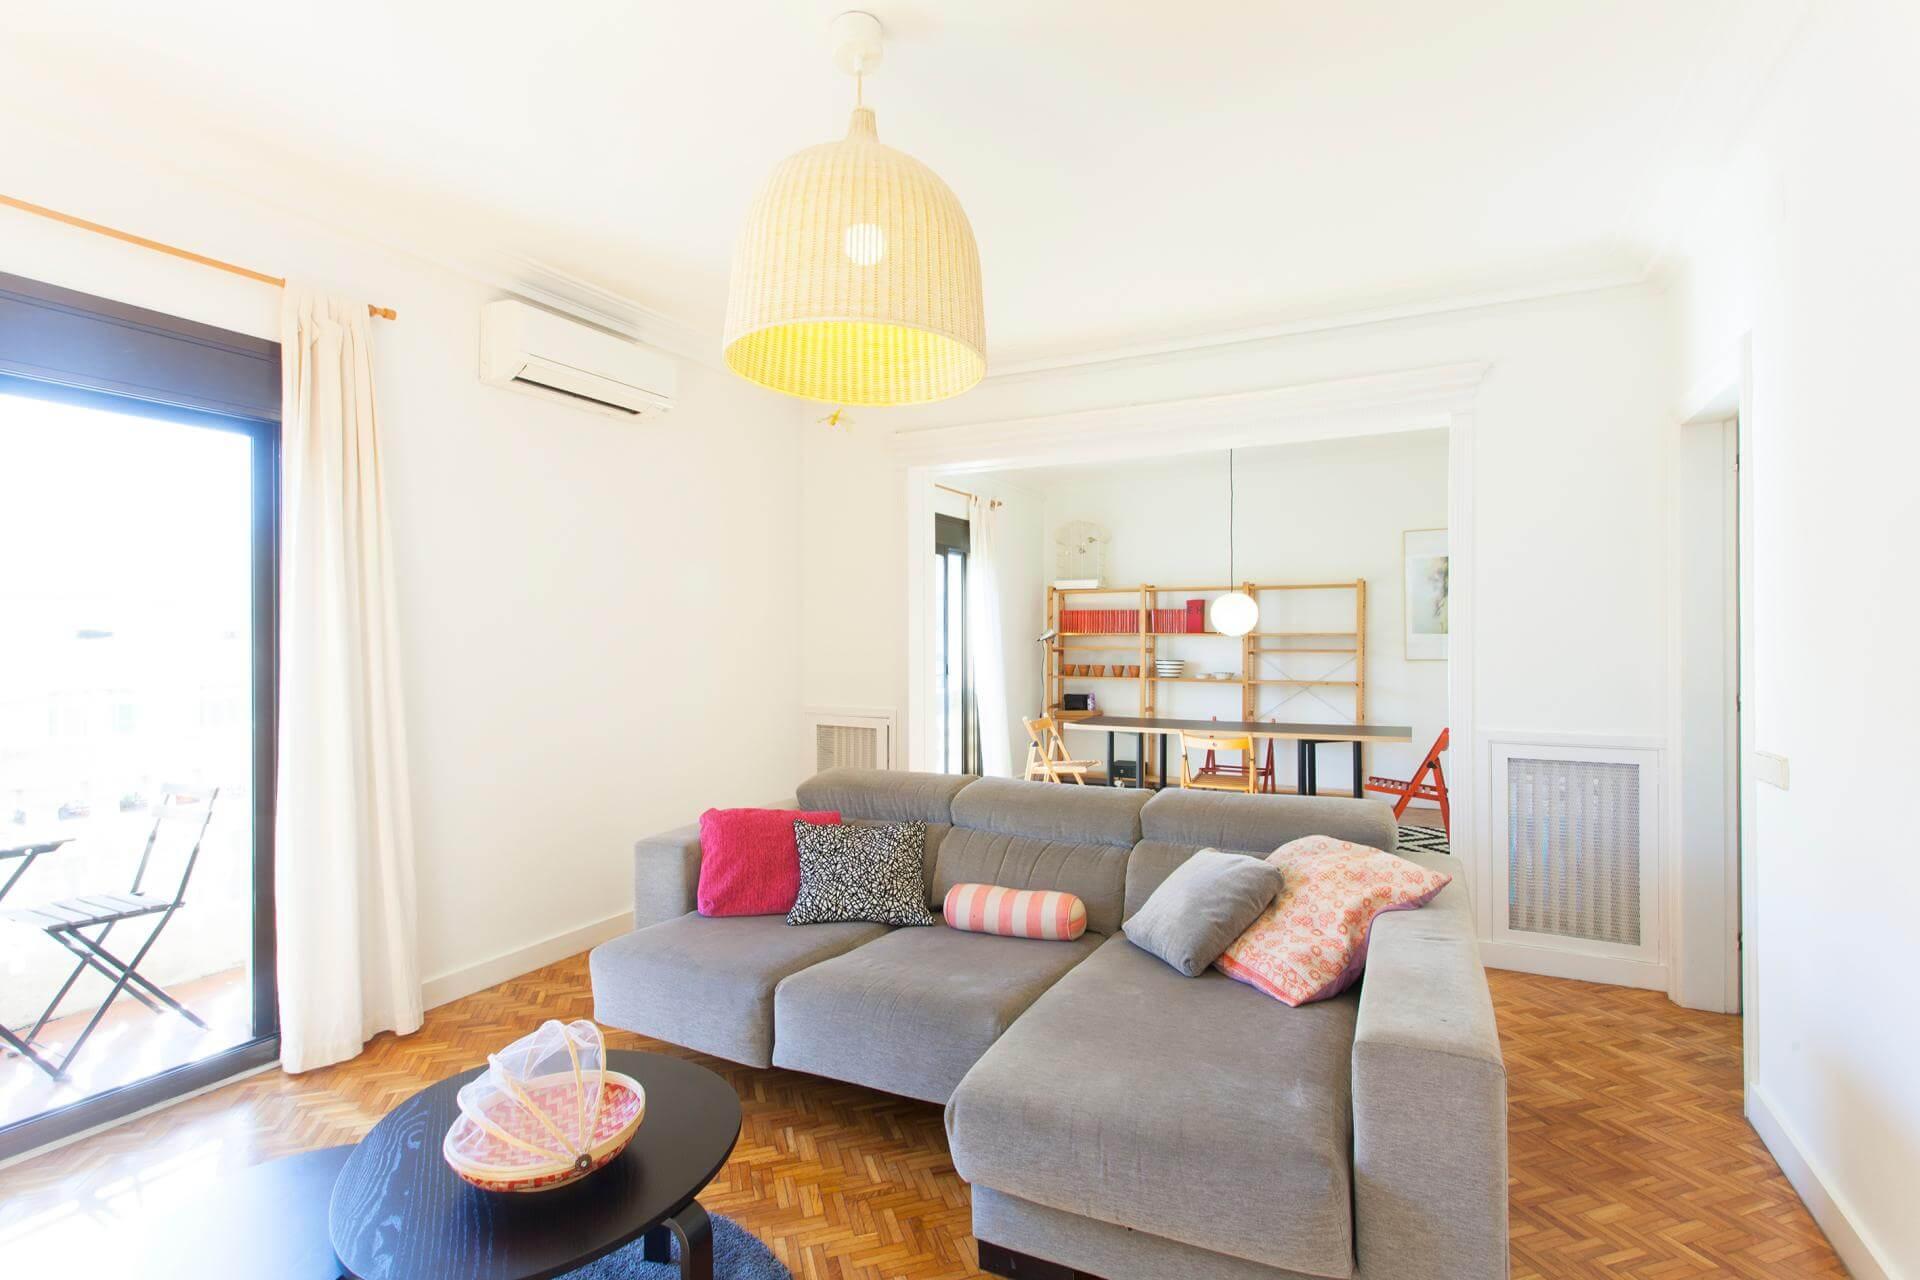 shbarcelona piso en alquiler con vistas a sagrada familia. Black Bedroom Furniture Sets. Home Design Ideas